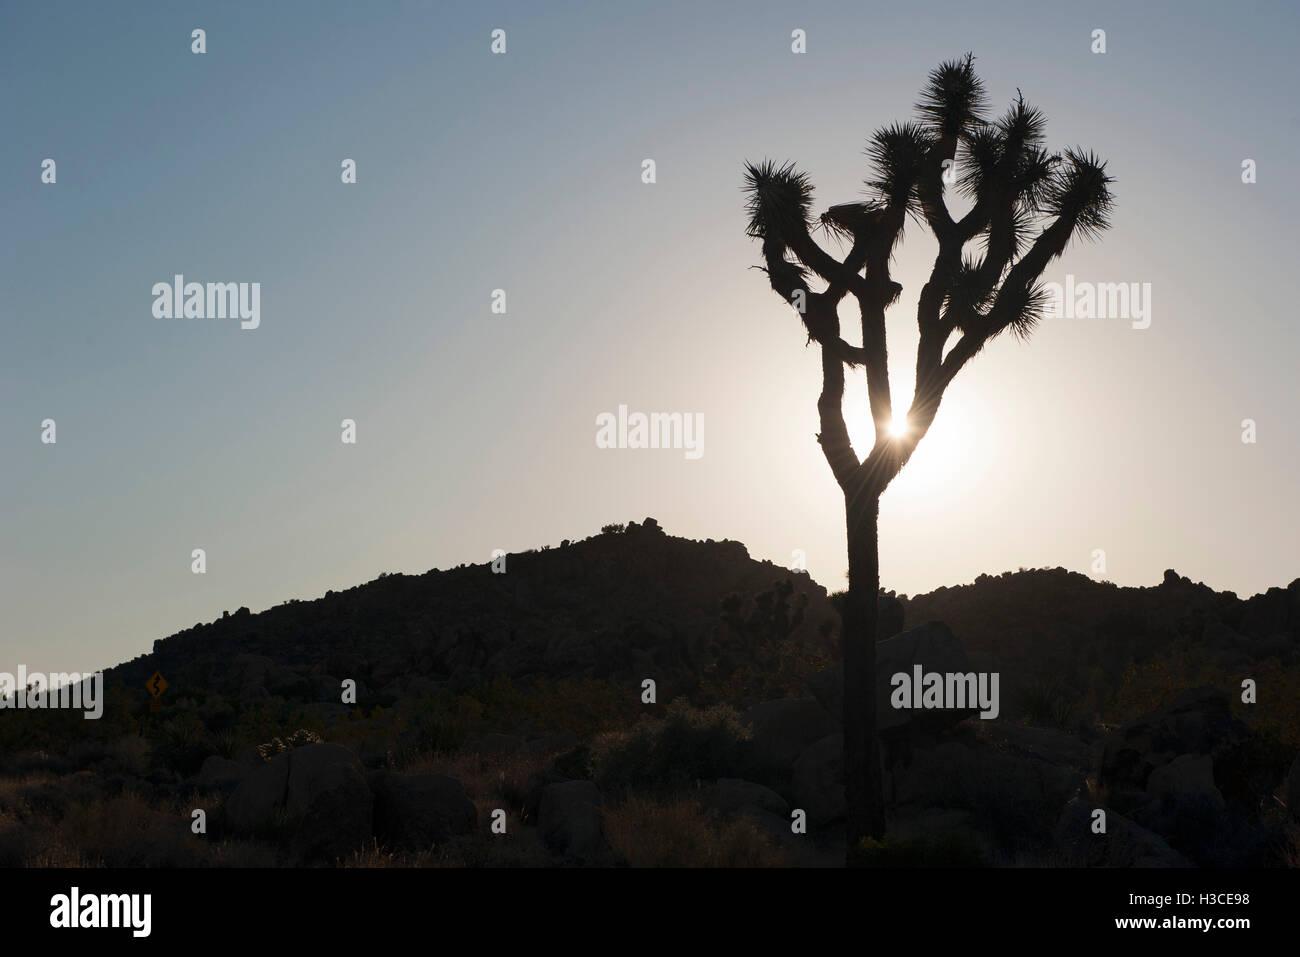 Joshua Tree Hintergrundbeleuchtung durch Sonne, Joshua Tree Nationalpark, Kalifornien, USA Stockfoto